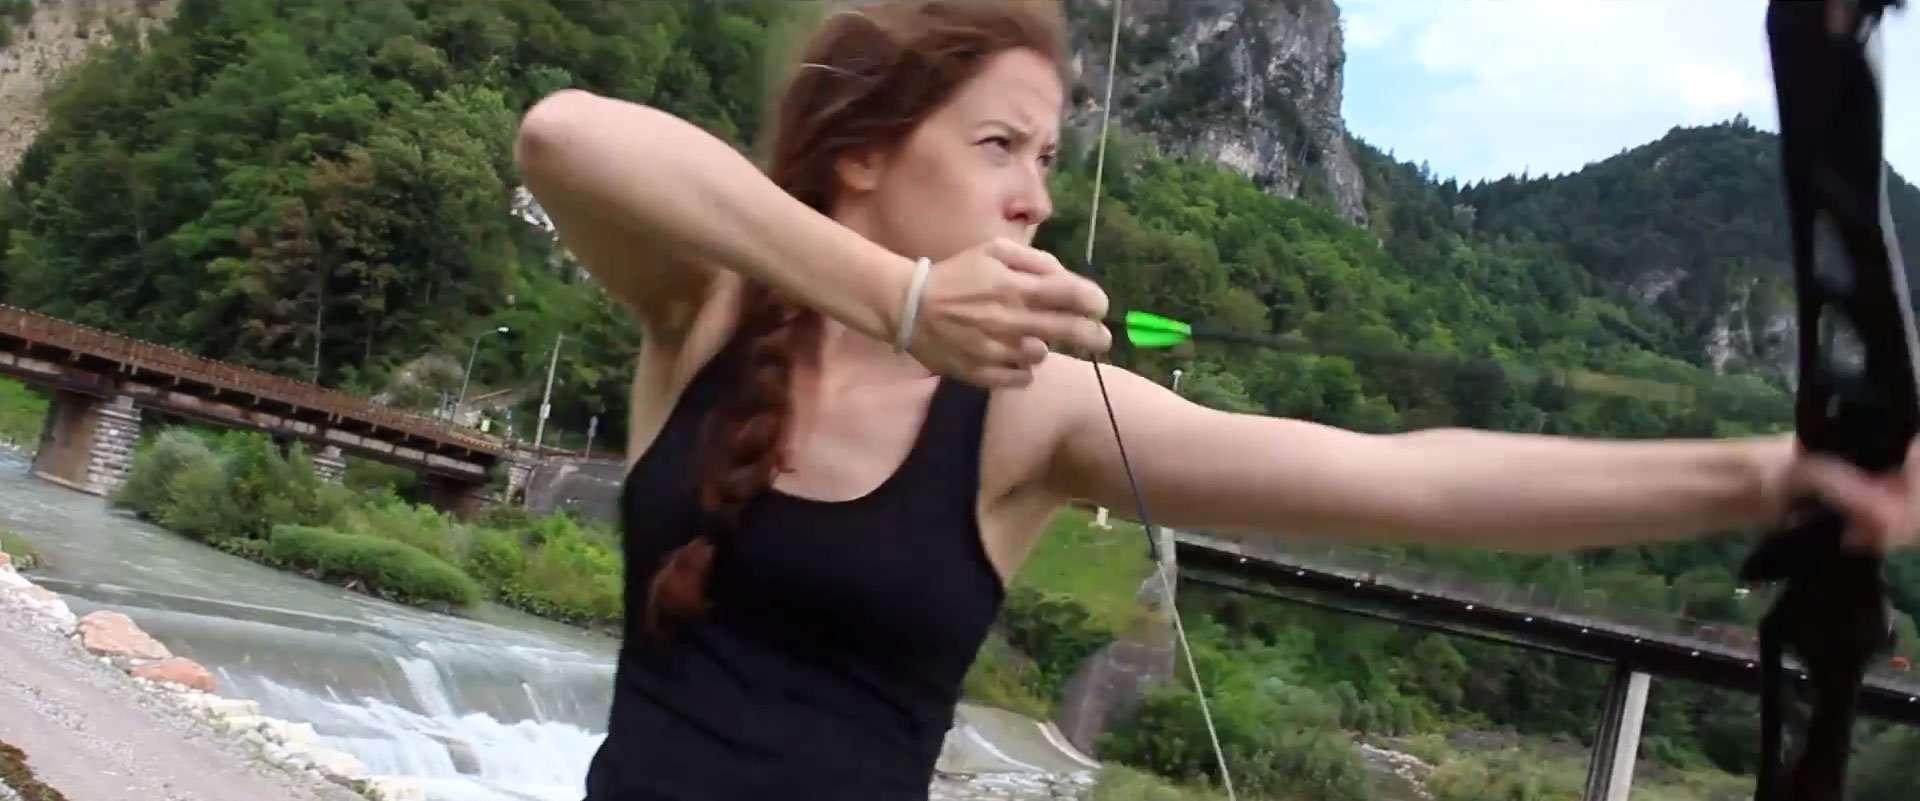 Hunger Games Trailer Remake Camposcuola Altercut Tiro con l'Arco